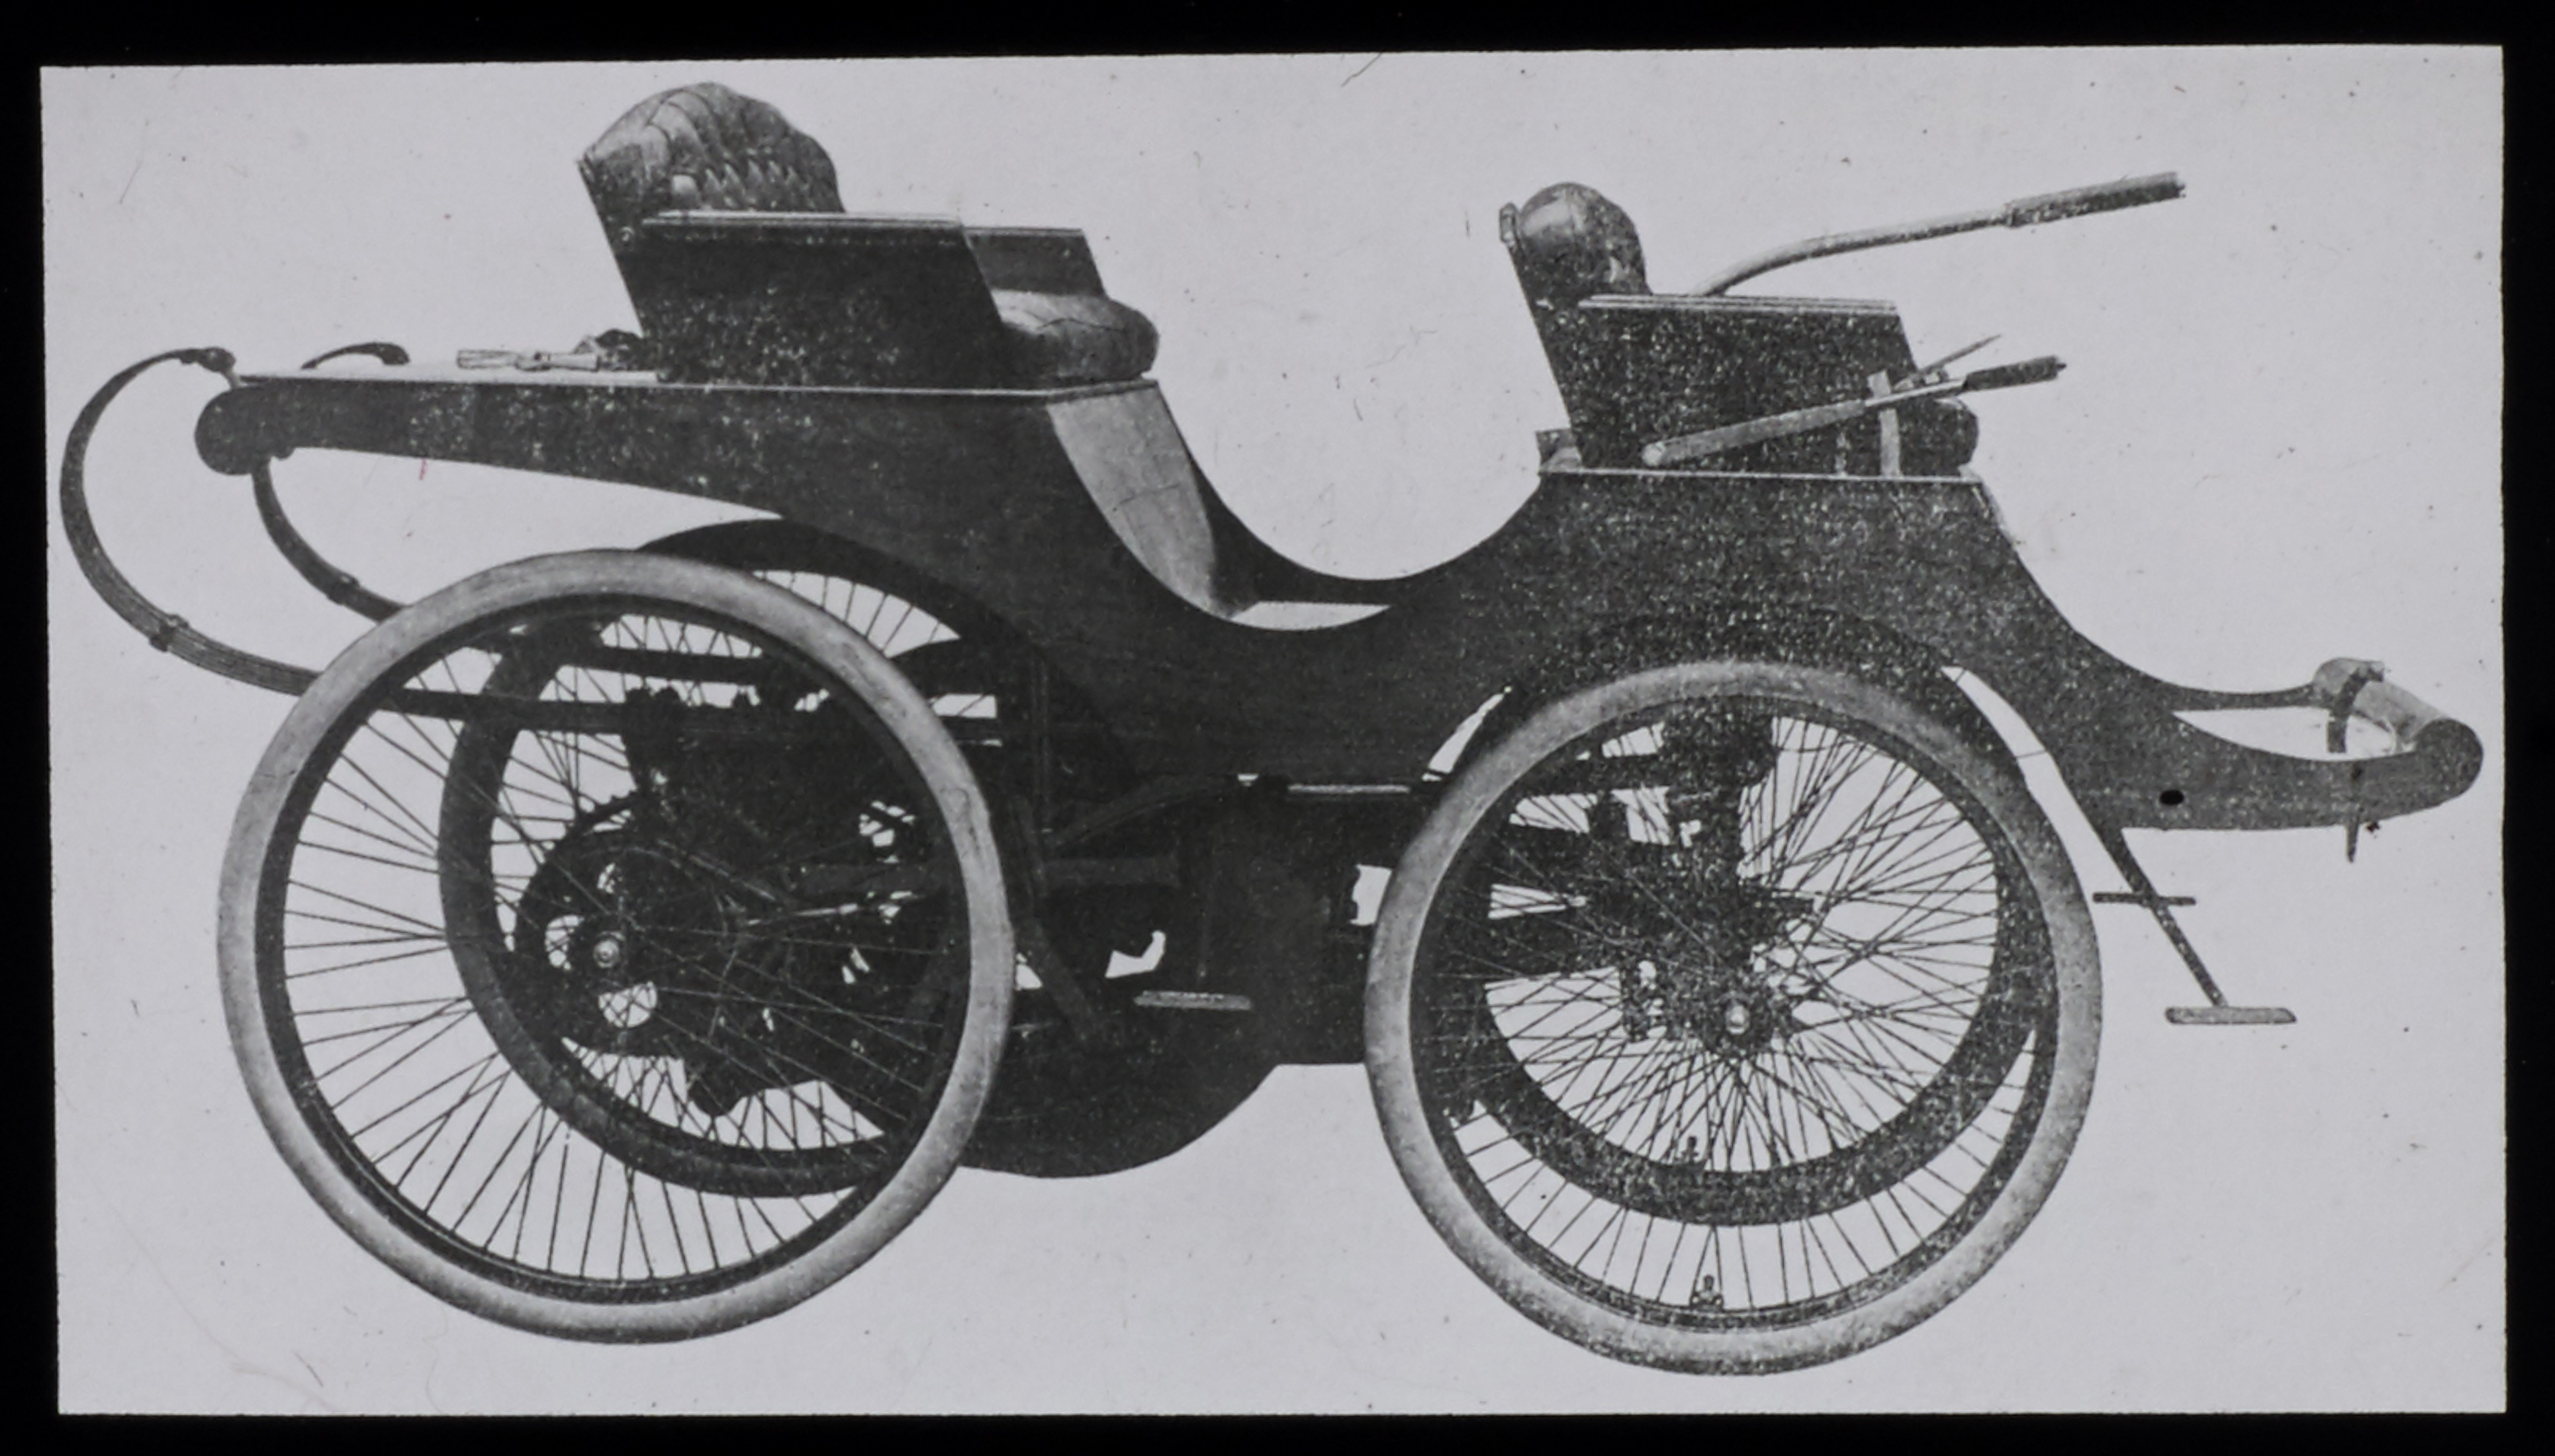 Lanchester Stanhope Phaeton car